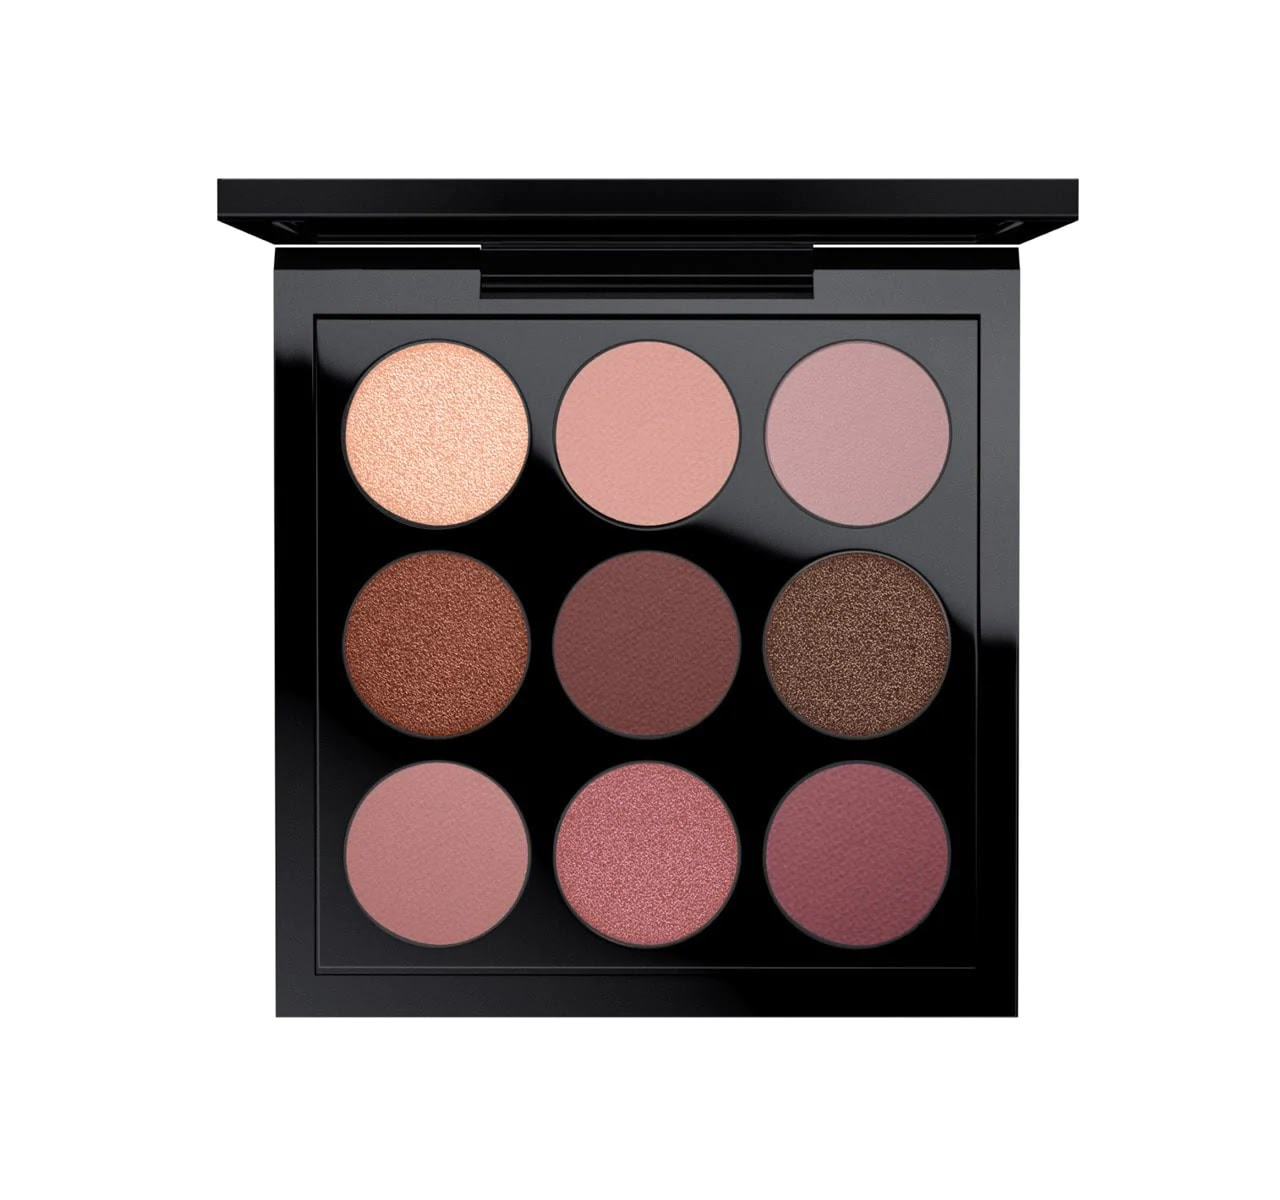 Makeup Wishlist Tag